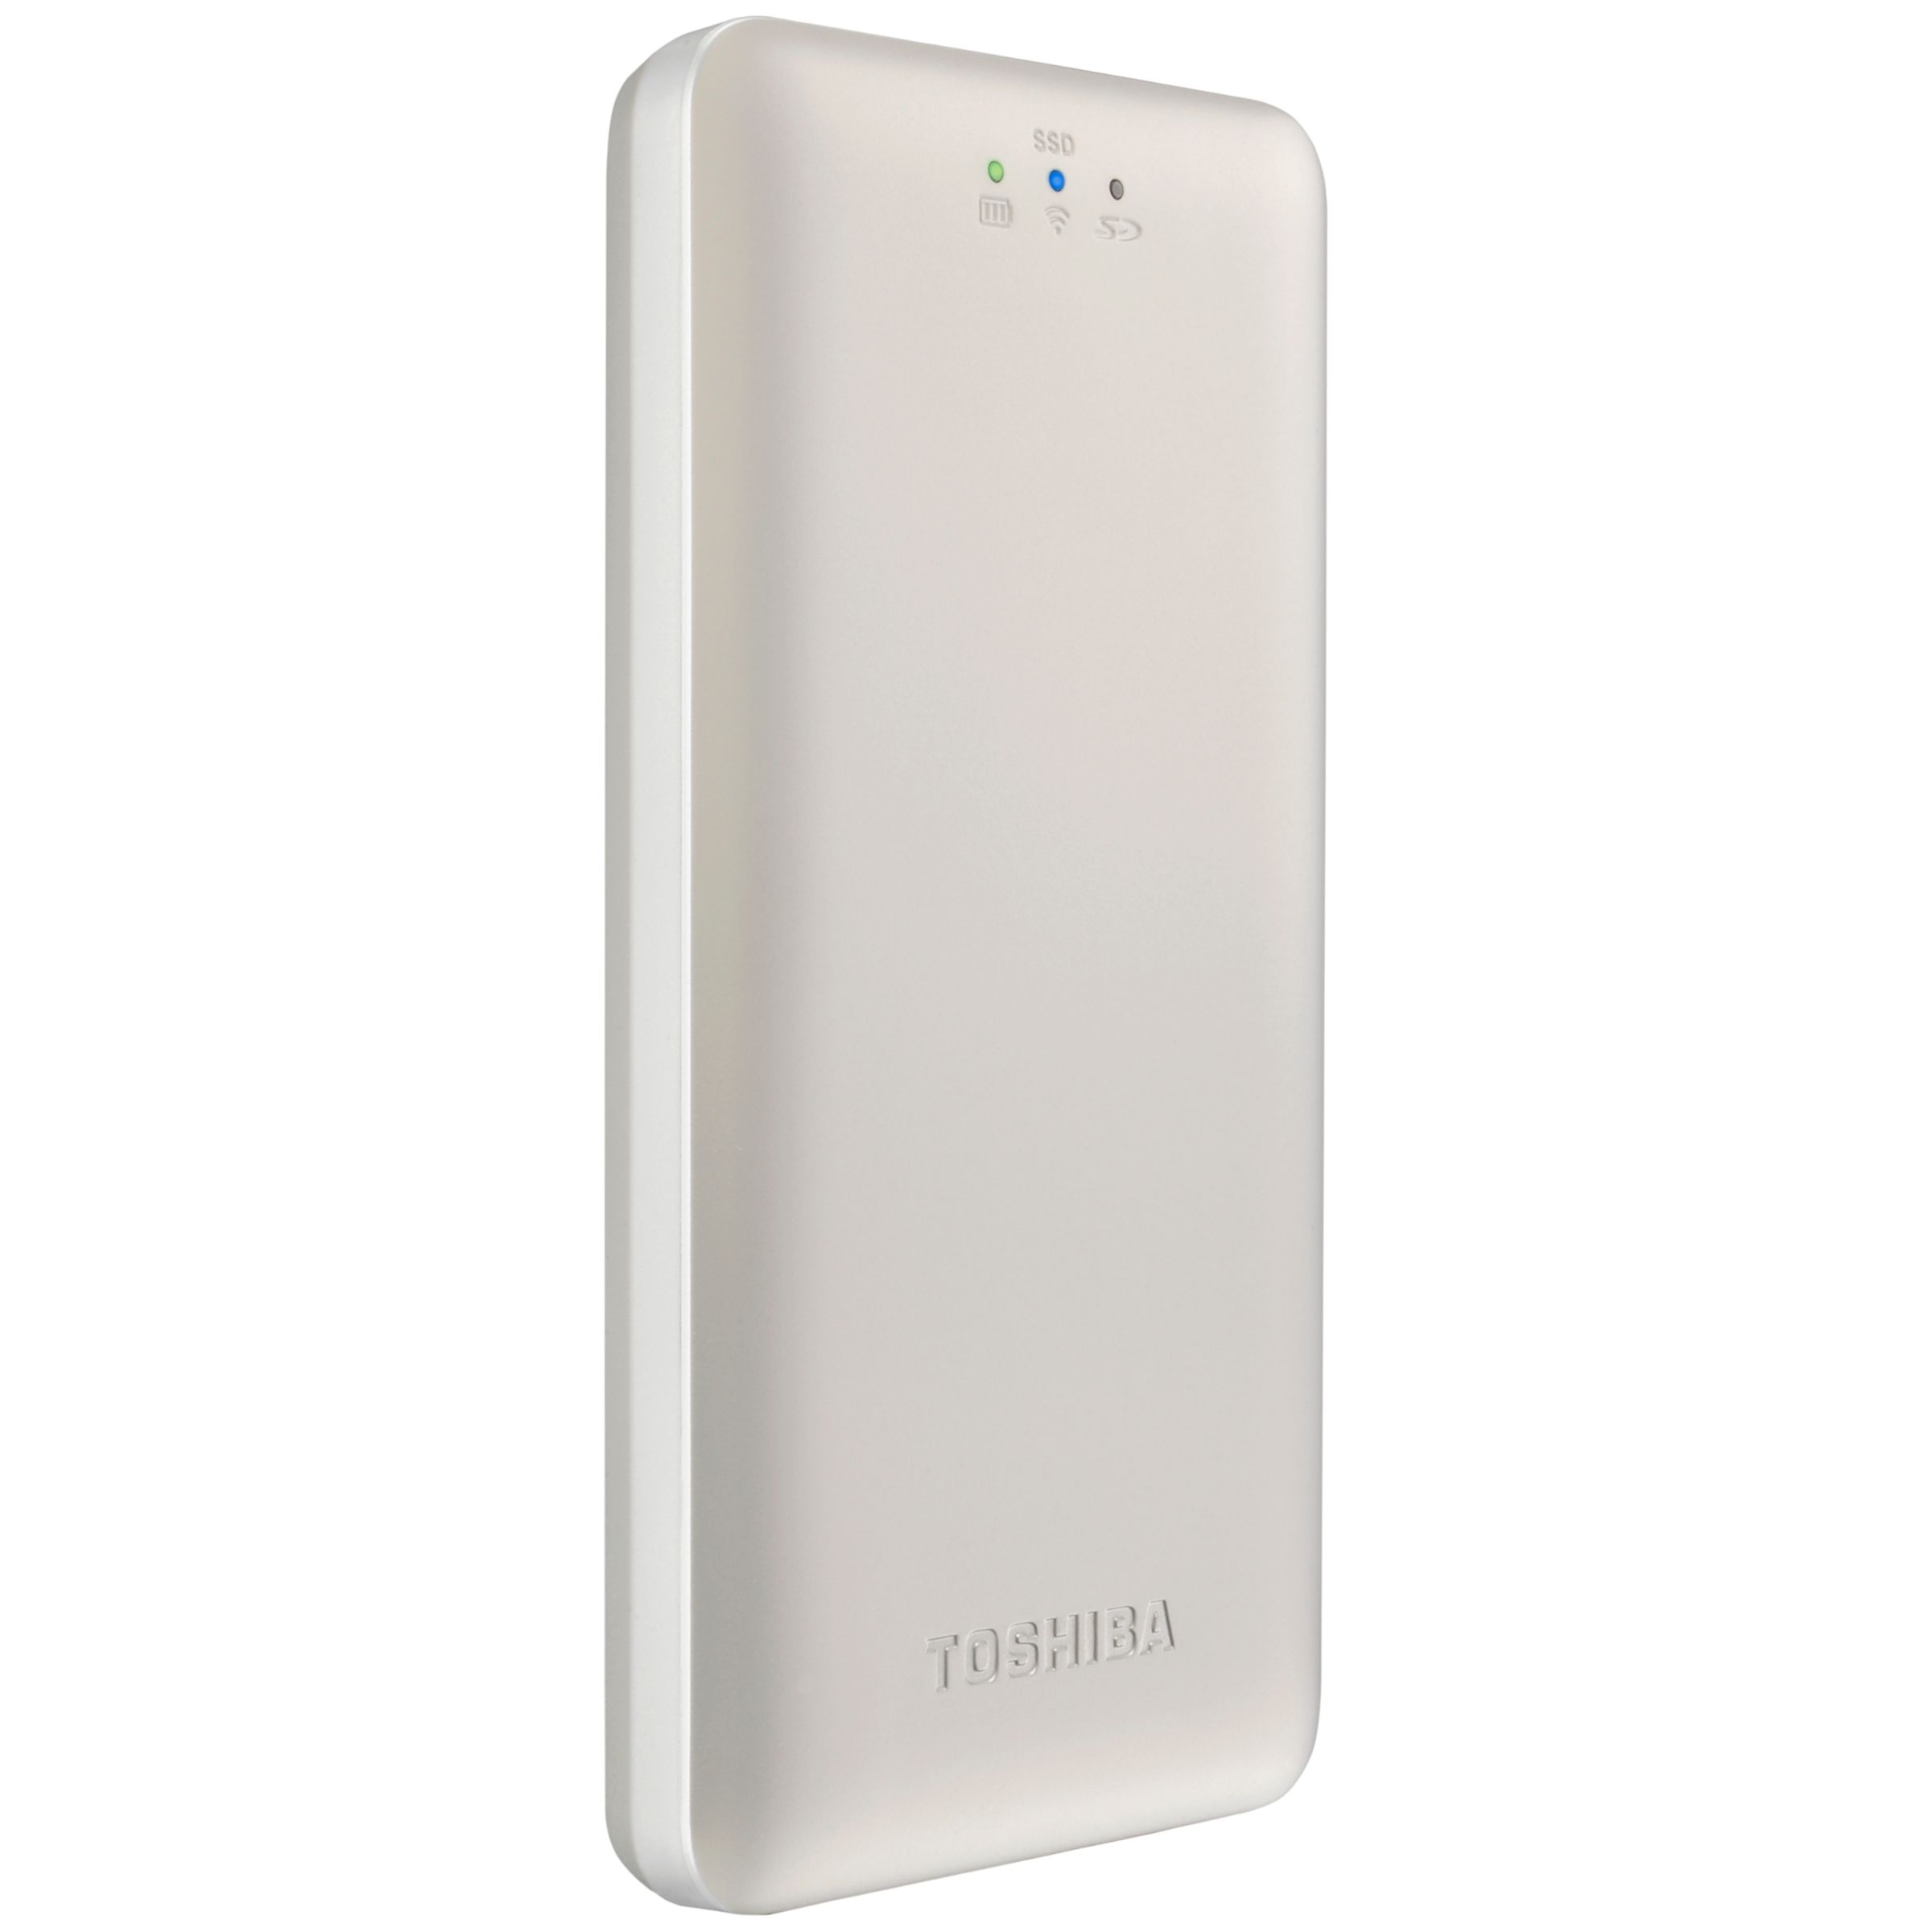 Toshiba Toshiba Canvio AeroMobile Wireless Portable Solid State Drive, USB 3.0, 128GB, Gold